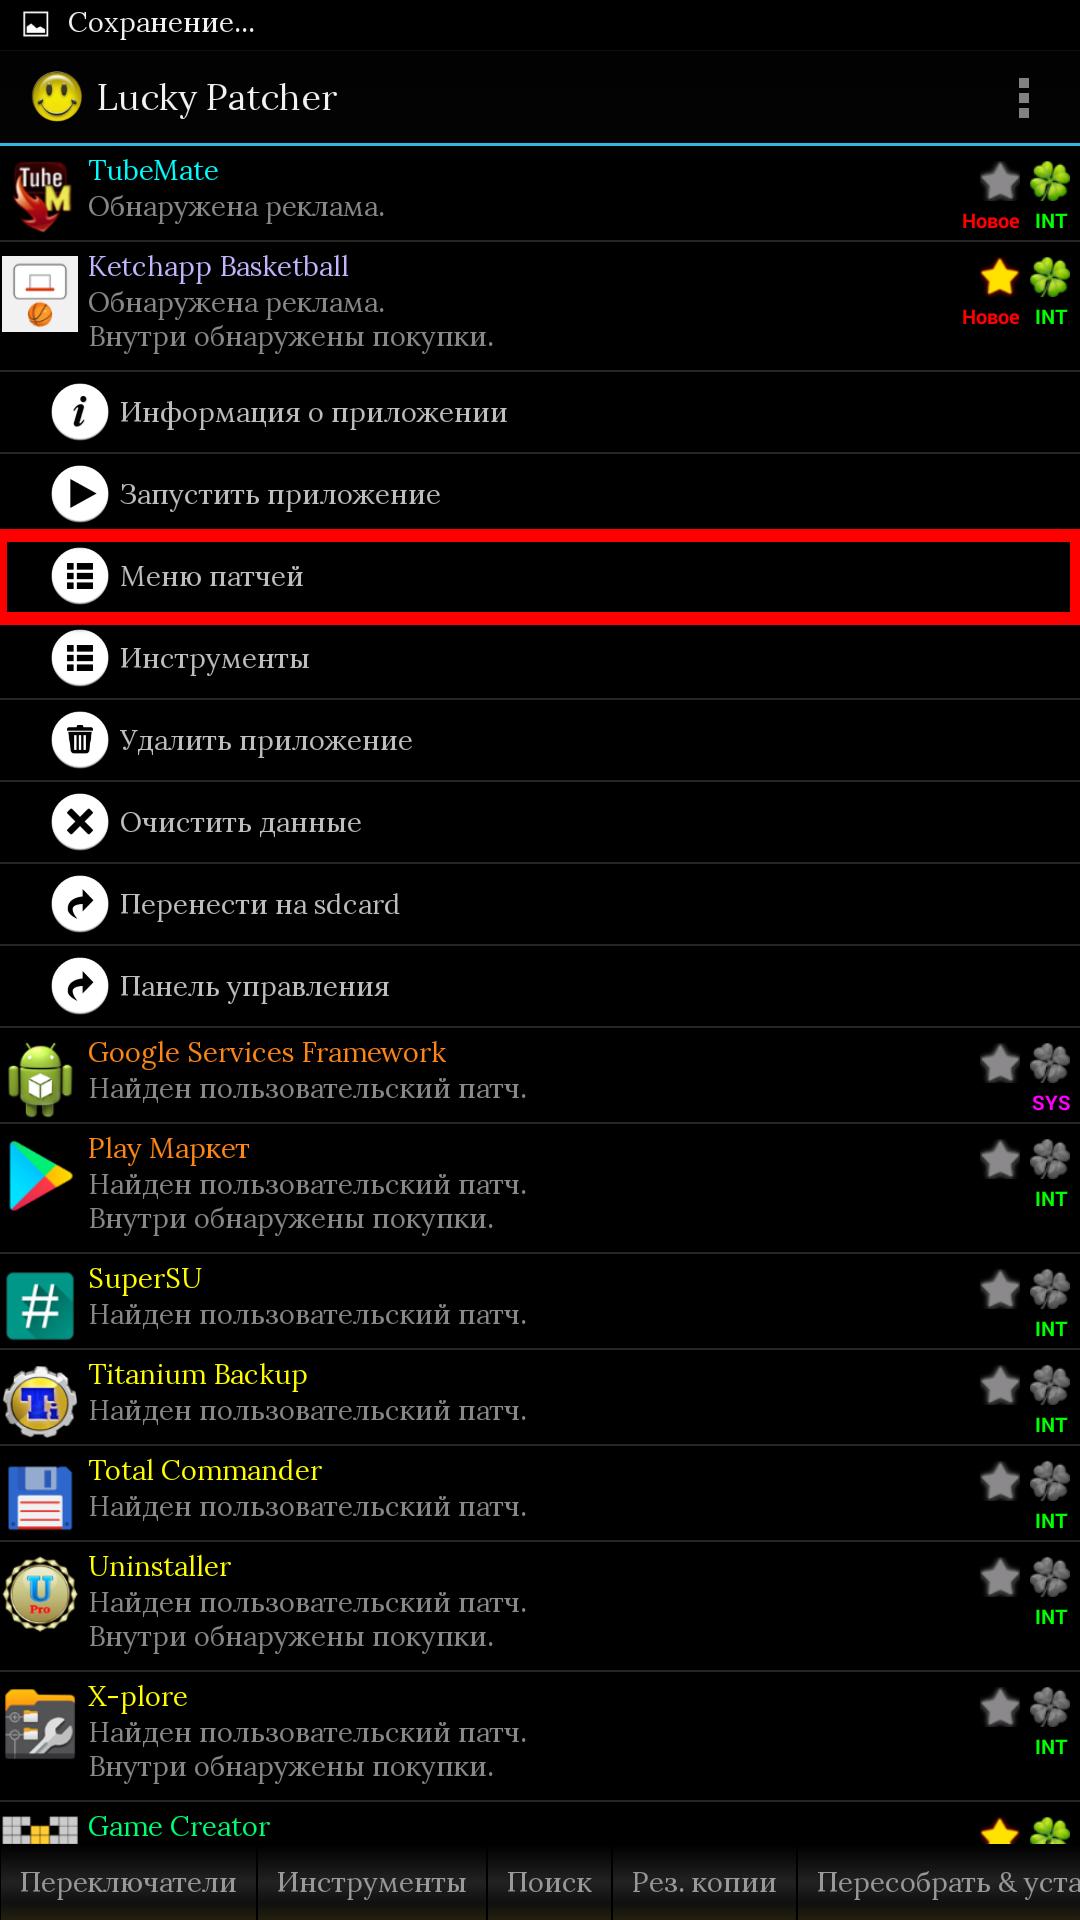 Lucky Patcher - взлом для Android Игры - lp_free_shoppin-2